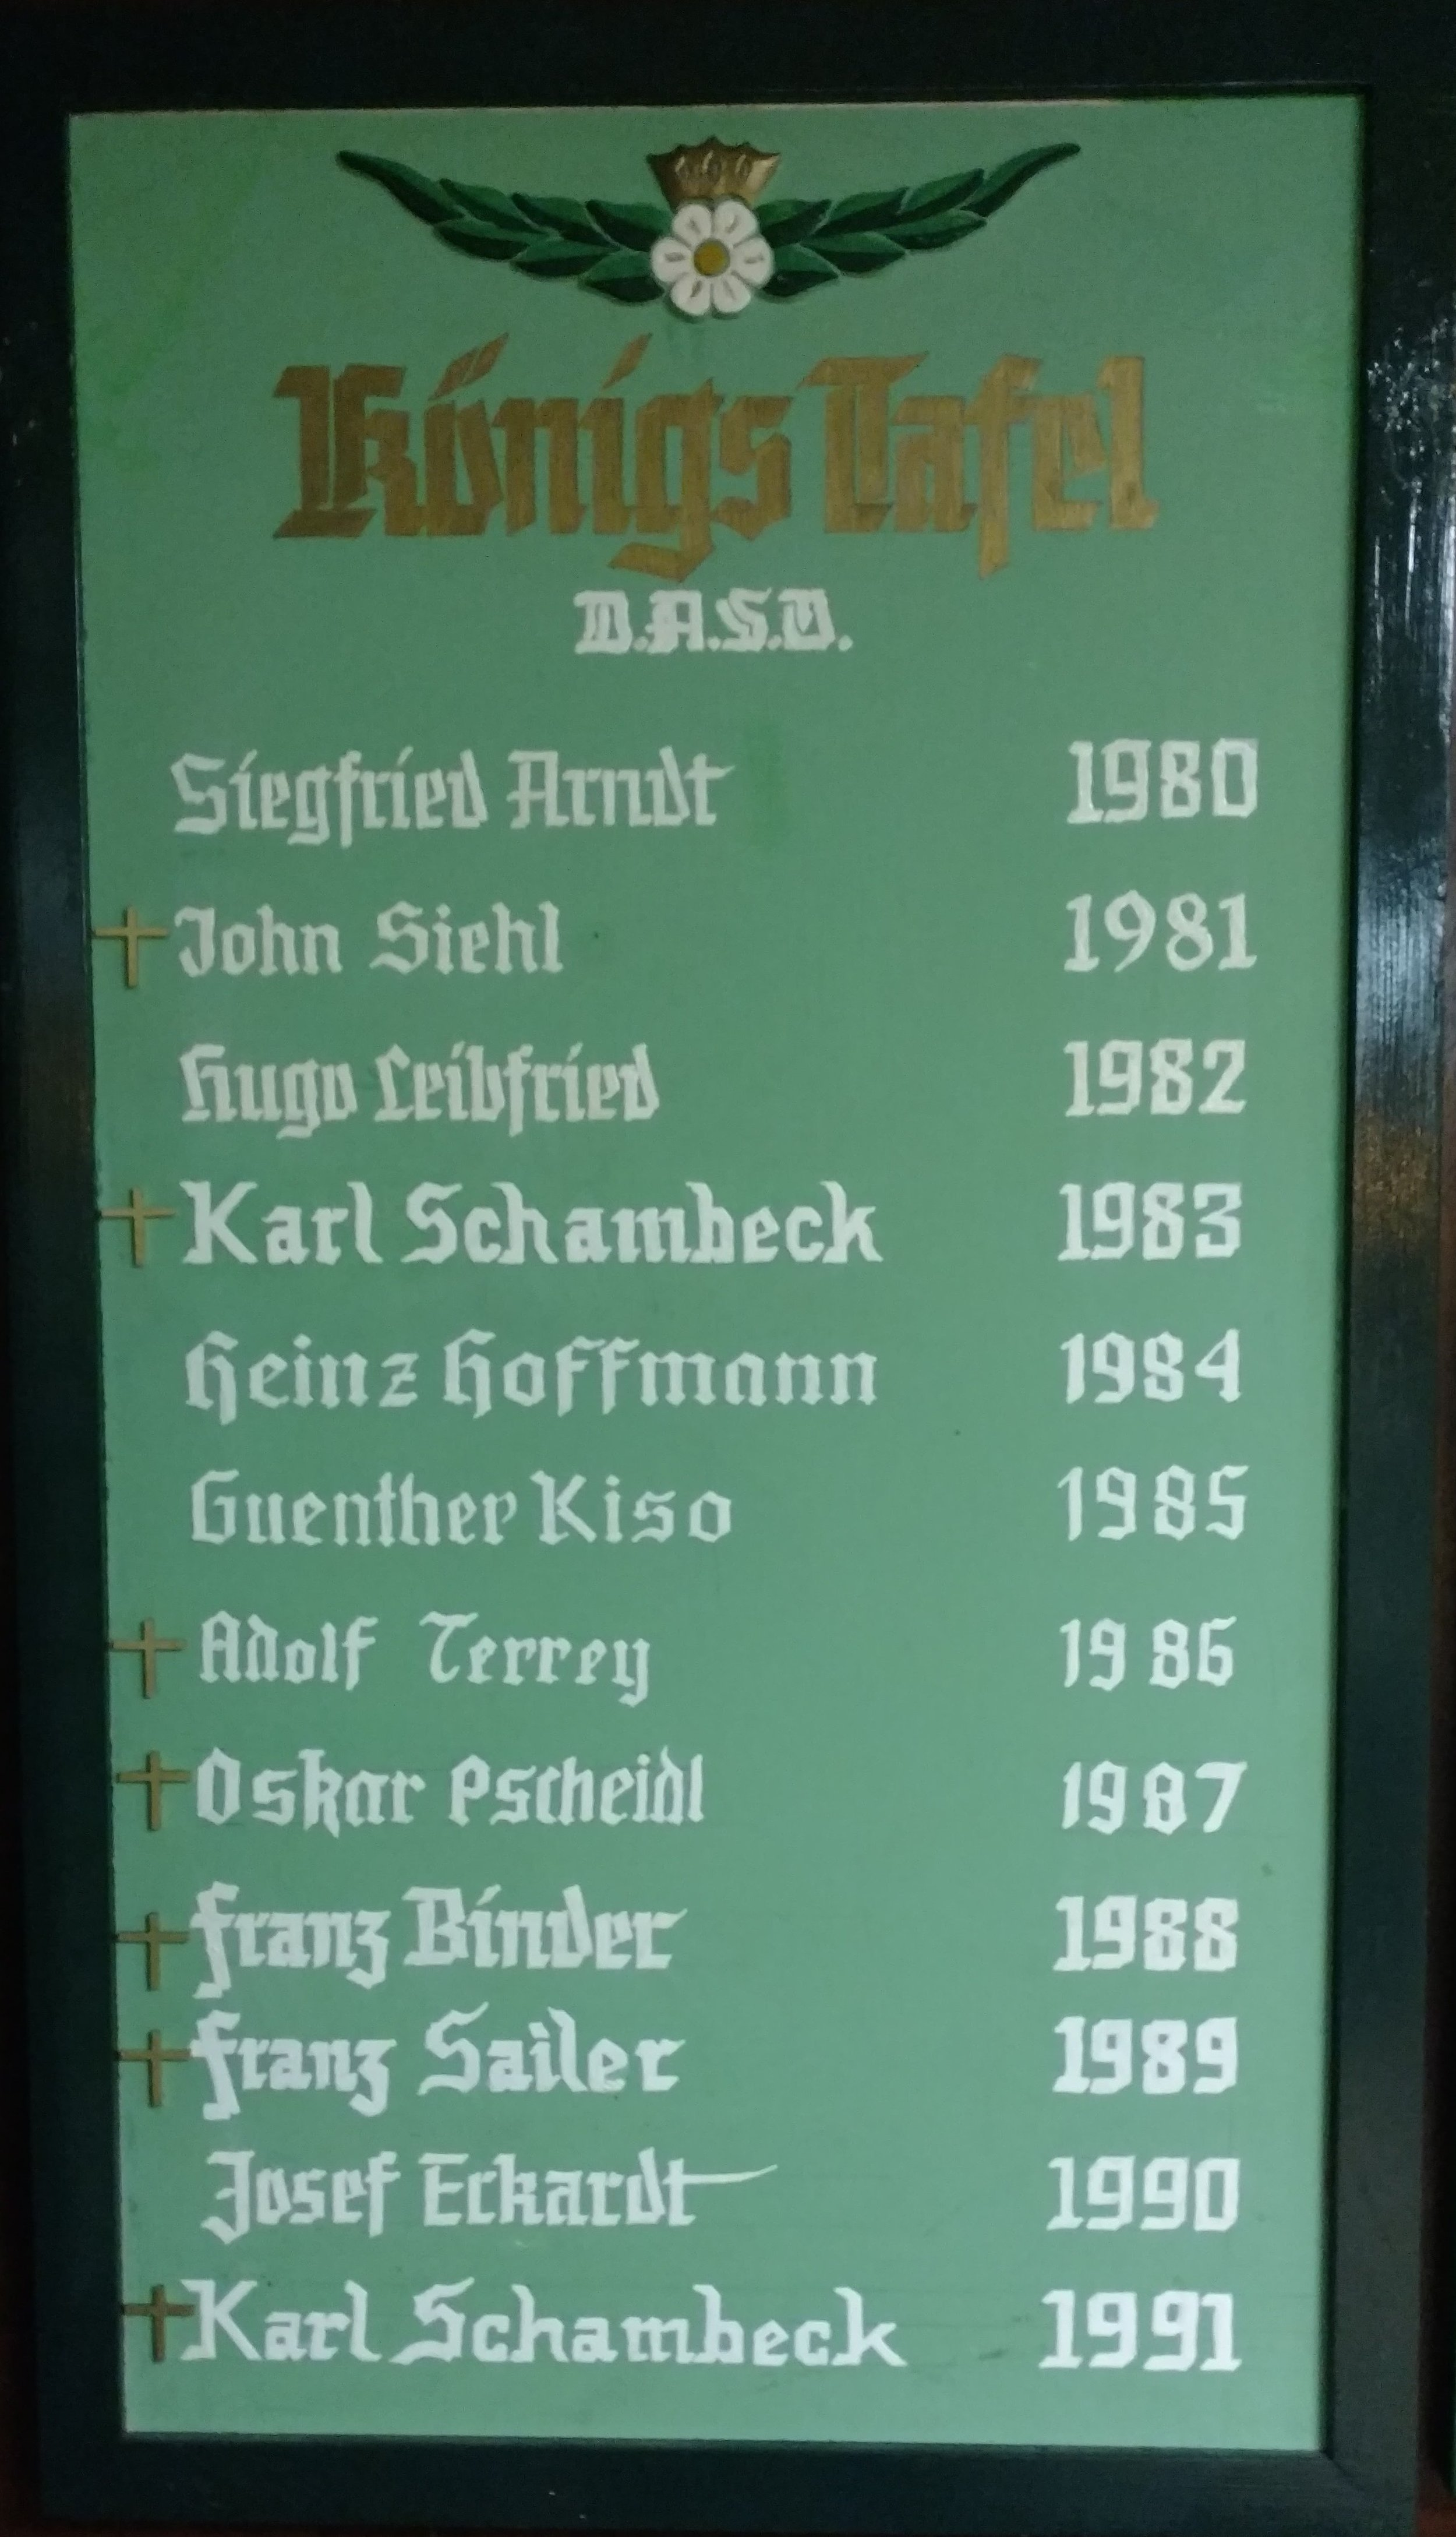 1980 - 1991